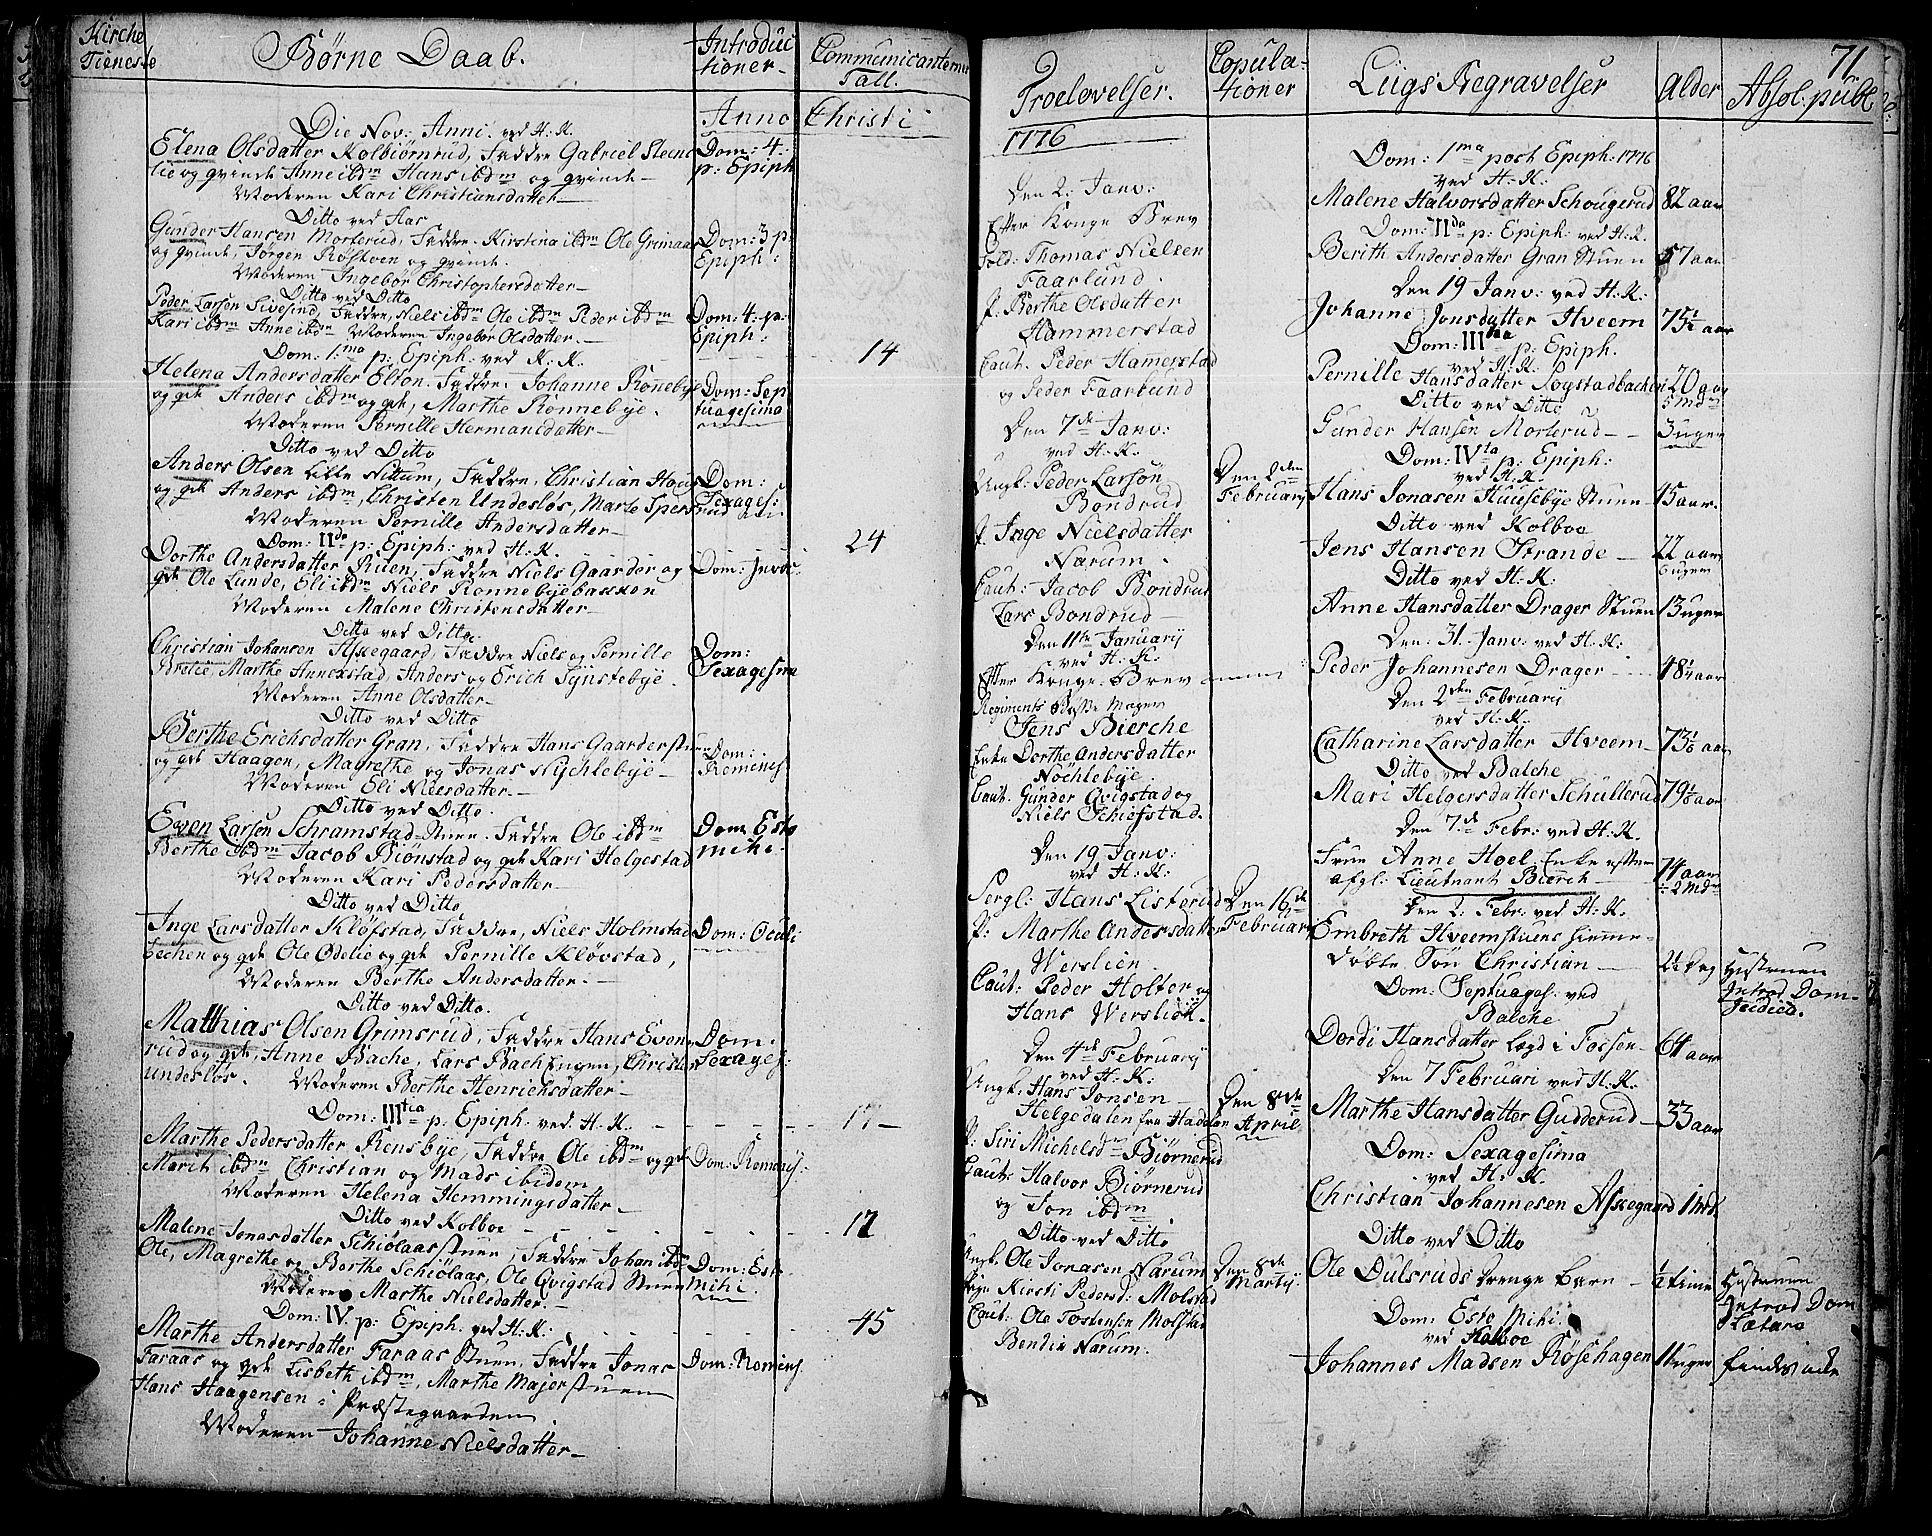 SAH, Toten prestekontor, Ministerialbok nr. 6, 1773-1793, s. 71